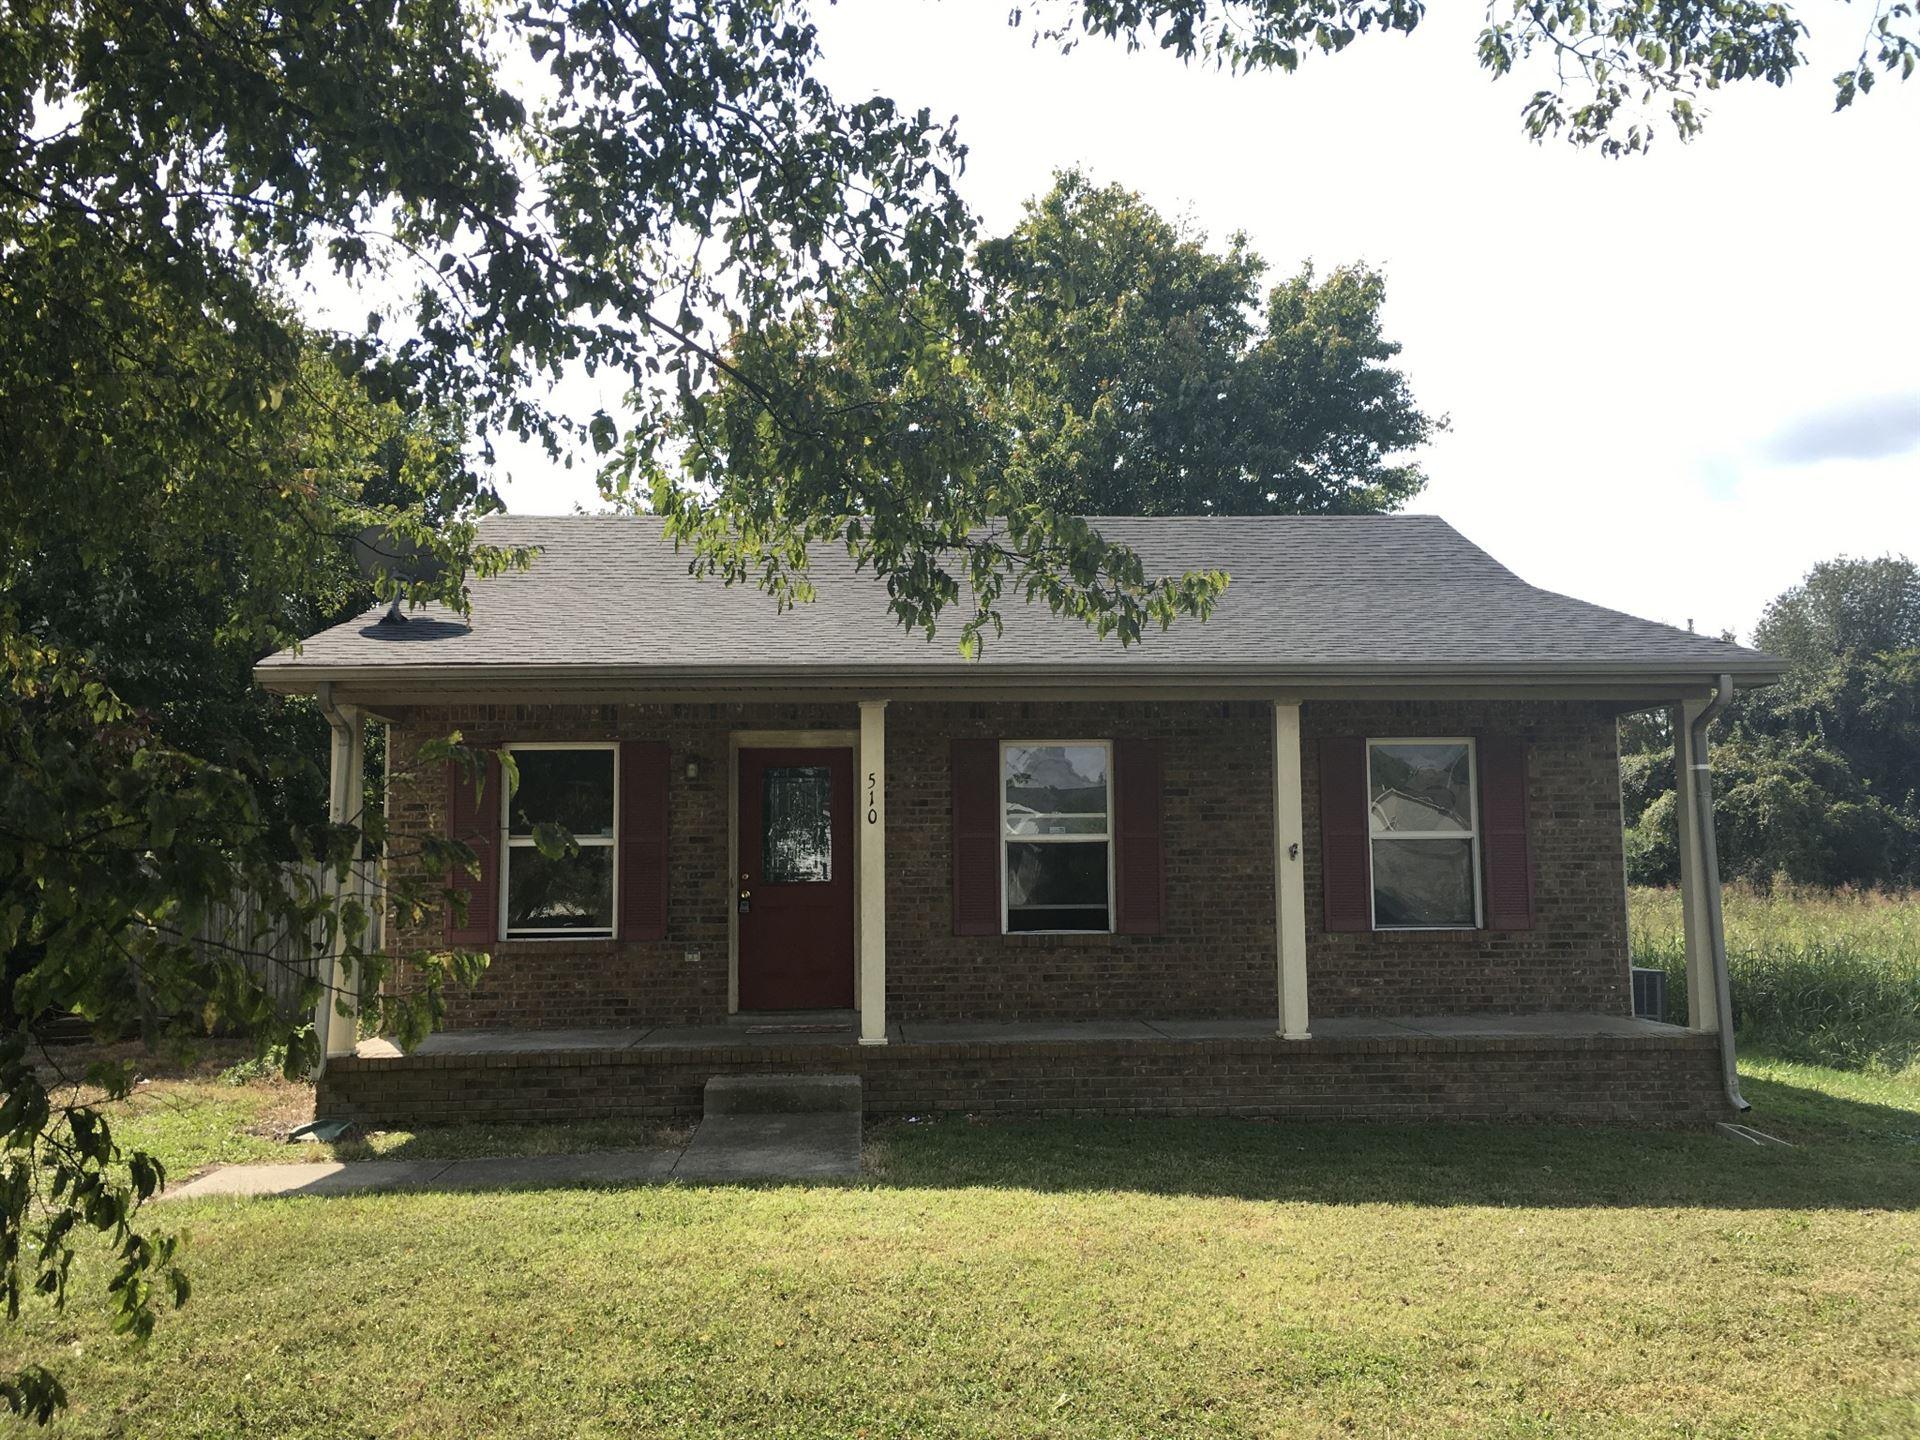 510 Gainey Dr, Oak Grove, KY 42262 - MLS#: 2196111